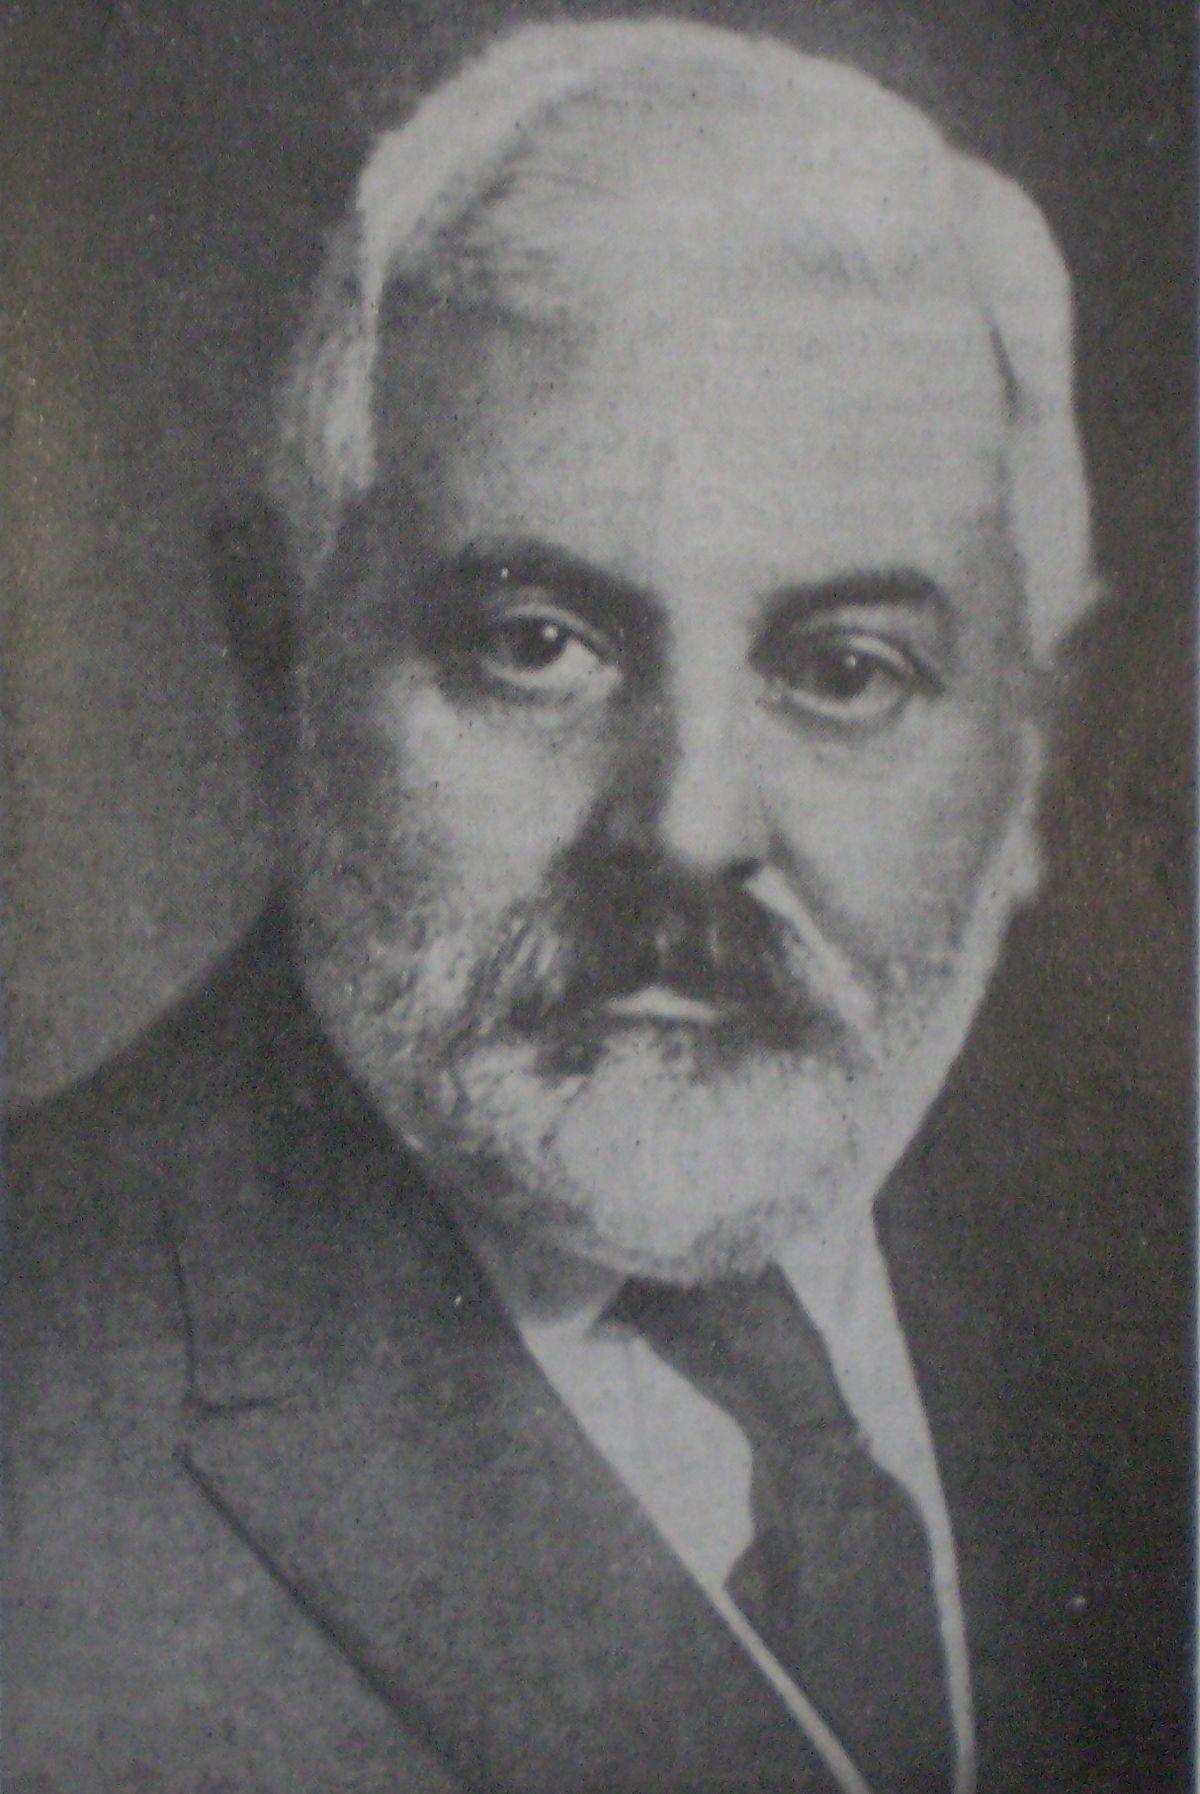 Juan Bautista Ambrosetti - Wikipedia, la enciclopedia libre